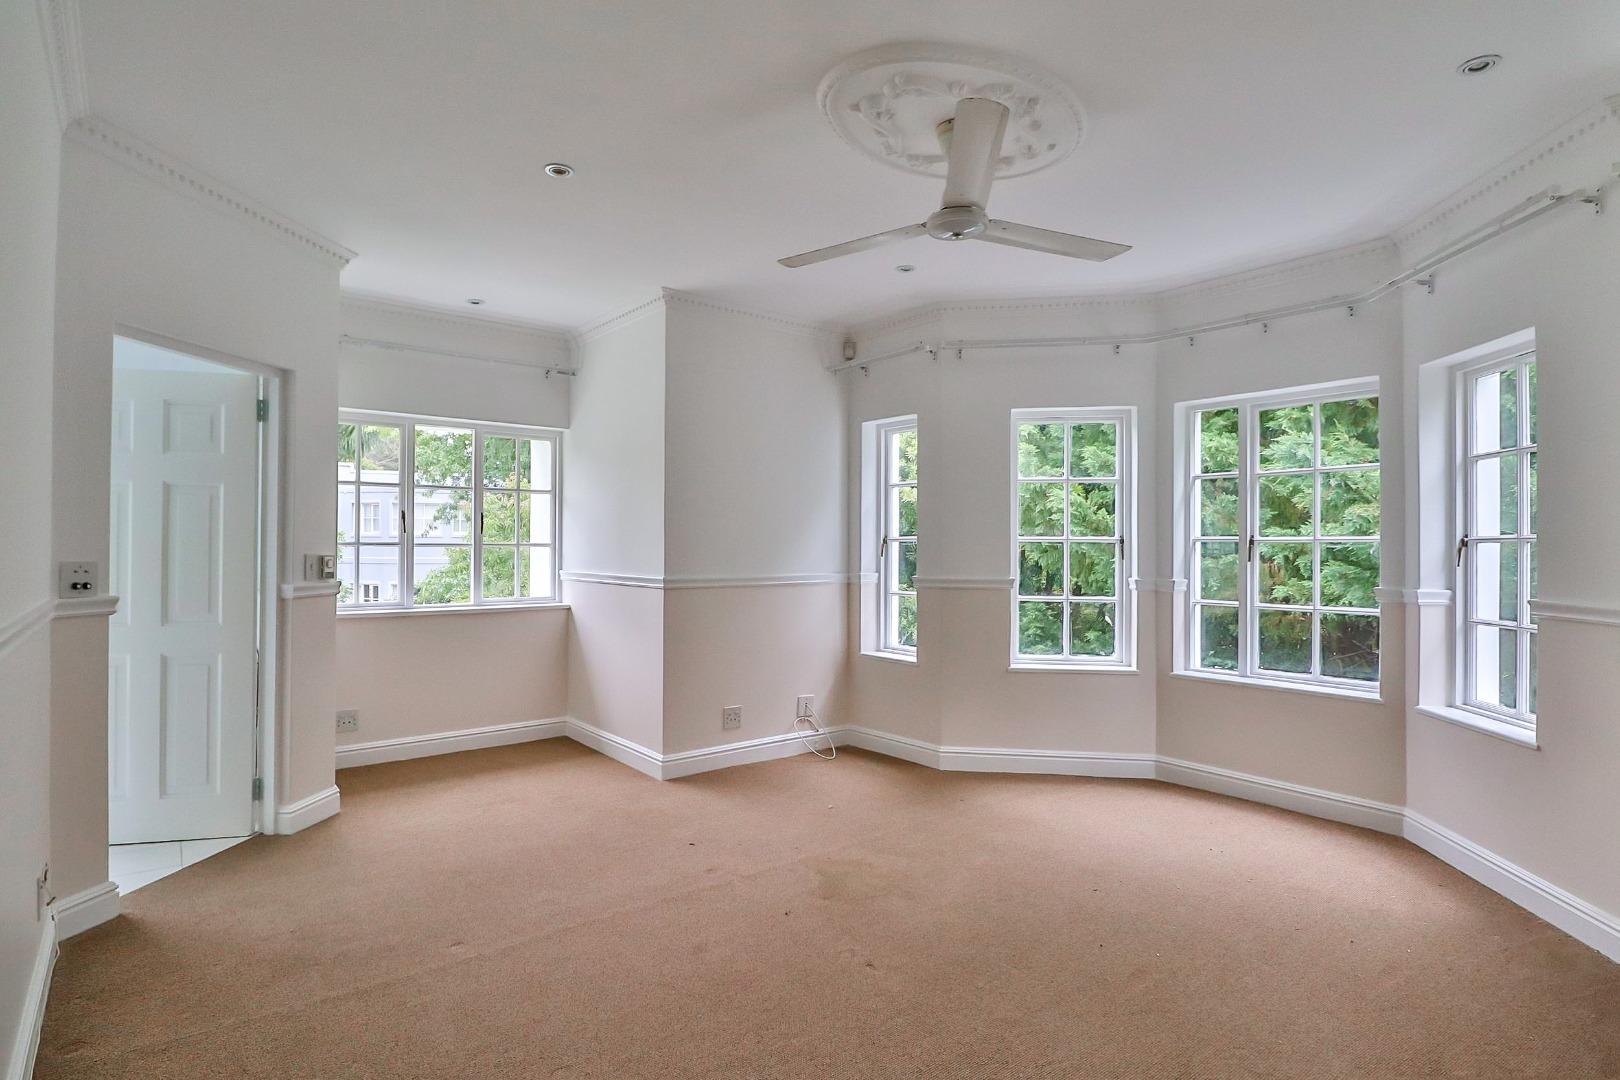 6 Bedroom House For Sale in Belvidere Estate